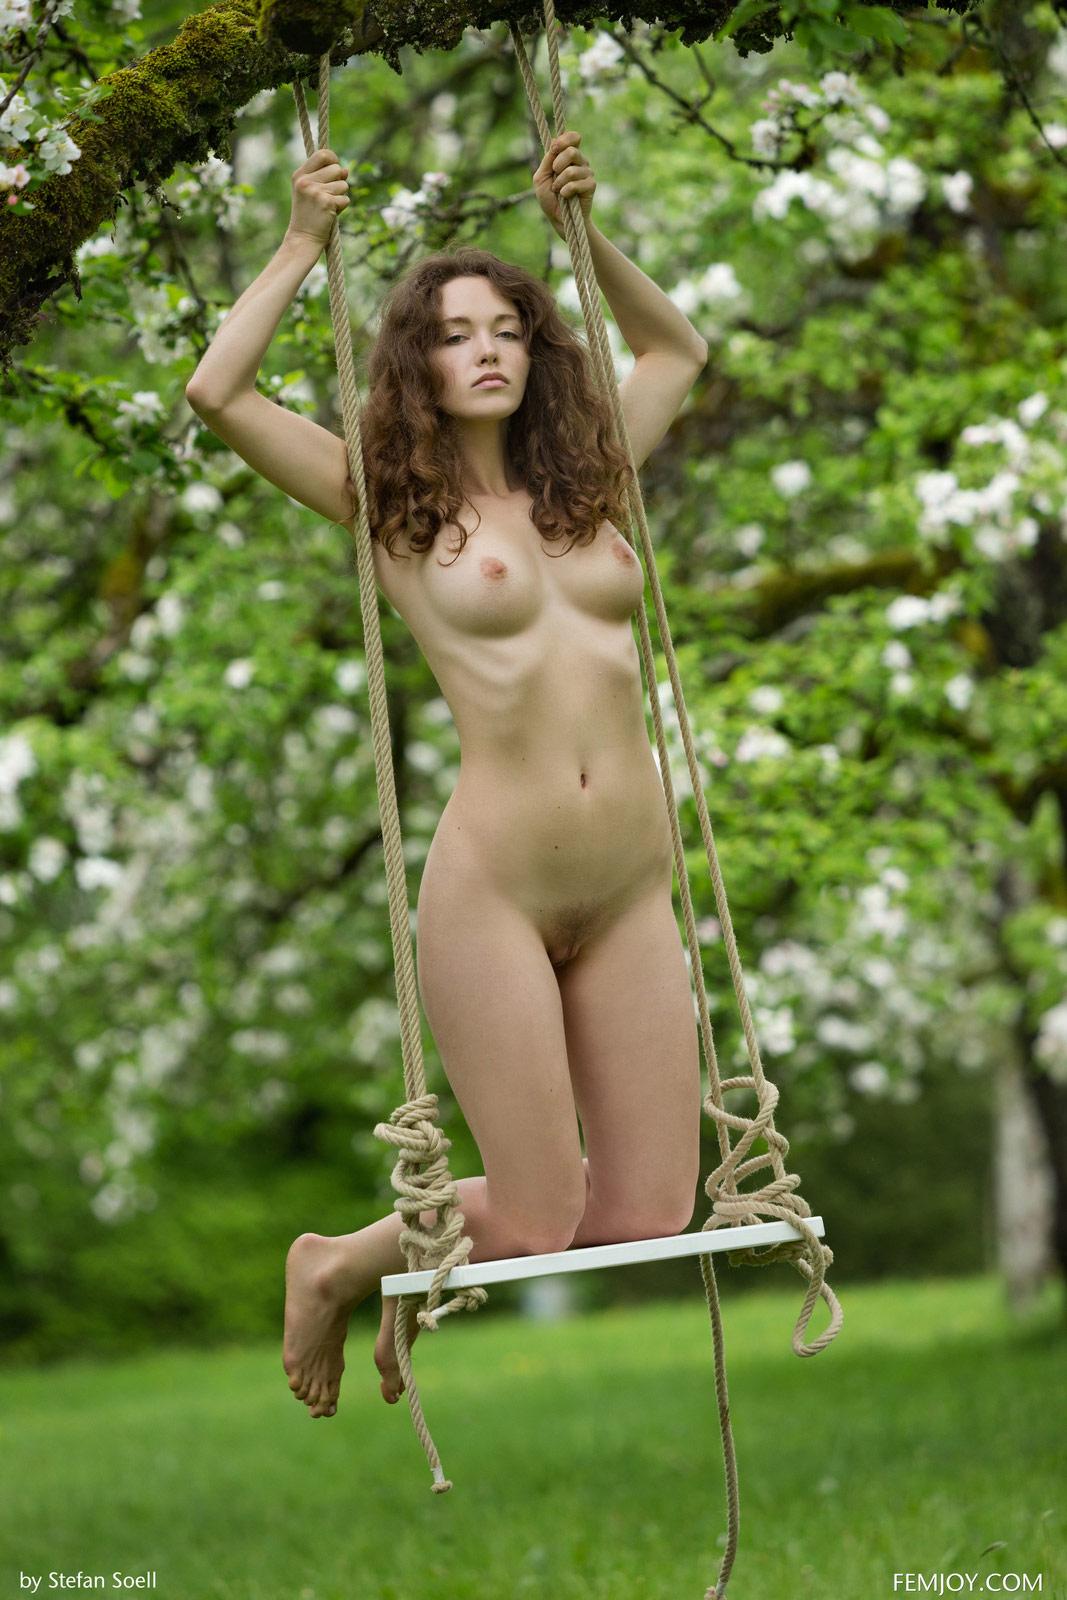 Photo By Stefan Soell | Photo Sexy Girls